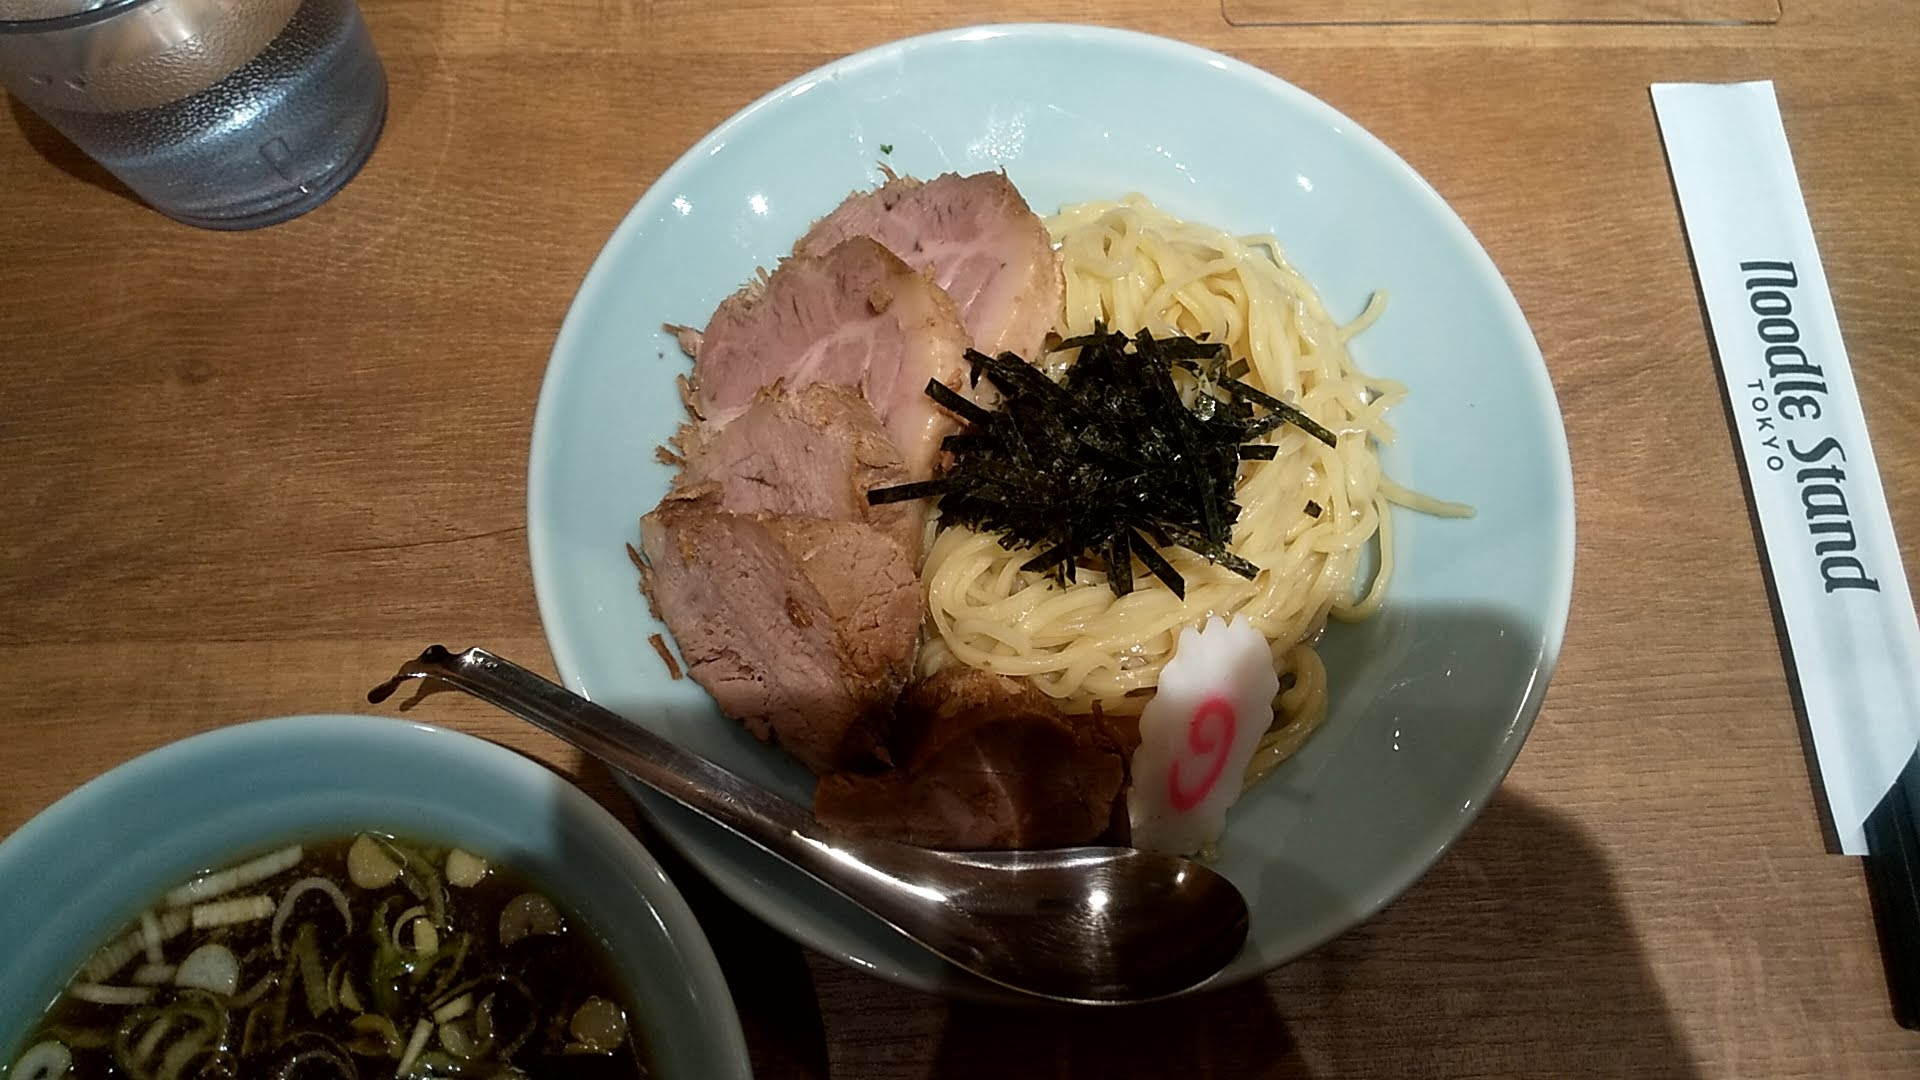 NoodleStandTokyoのTOKYO肉もり中華の麺皿写真